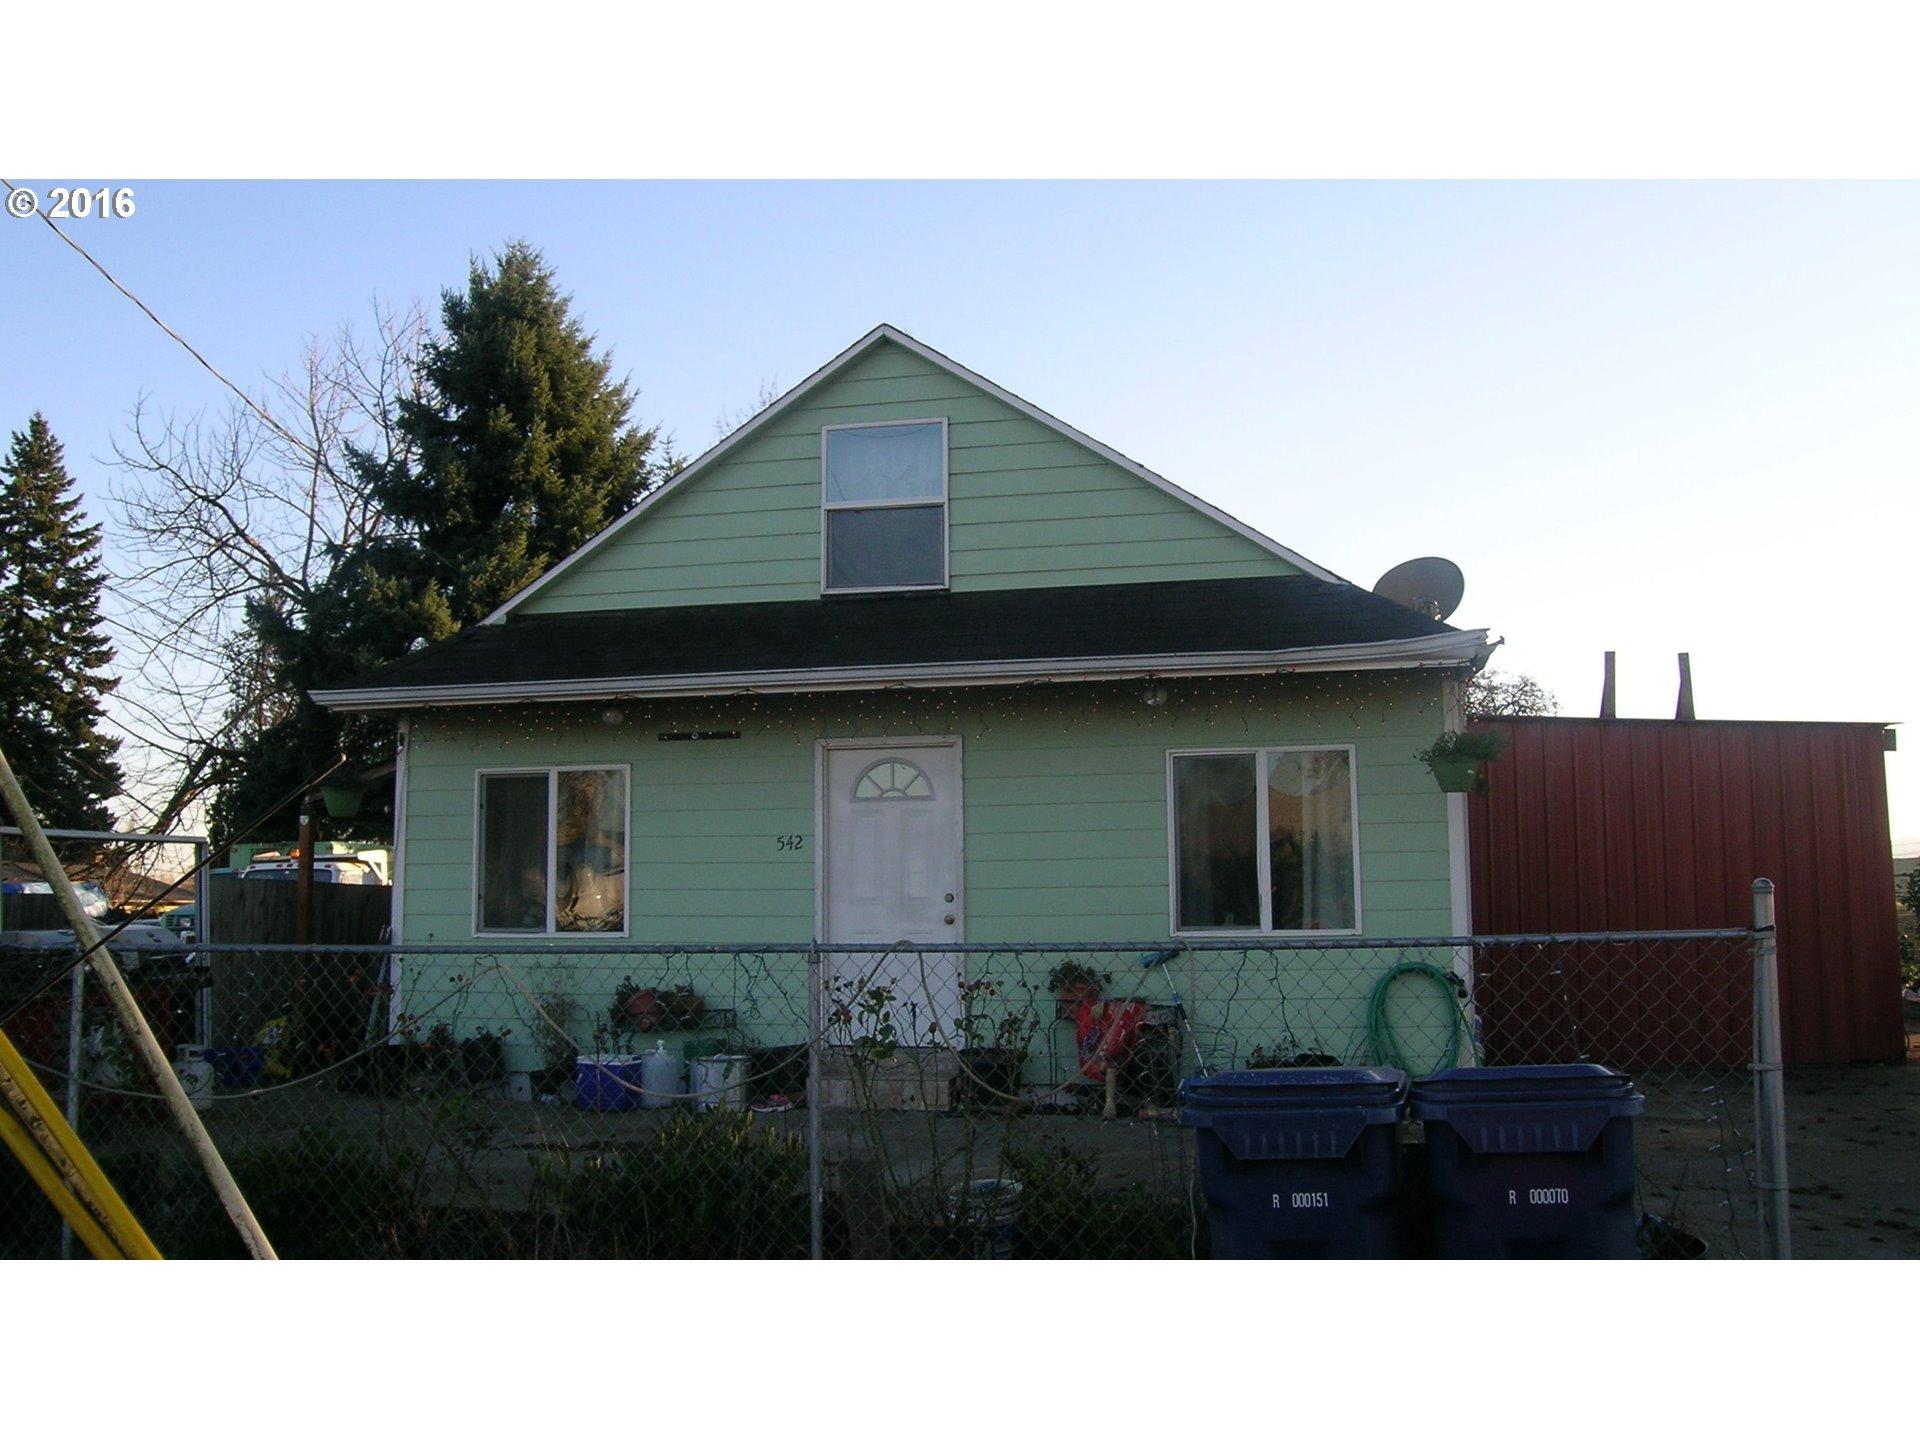 542 SW Walnut St, Hillsboro, OR